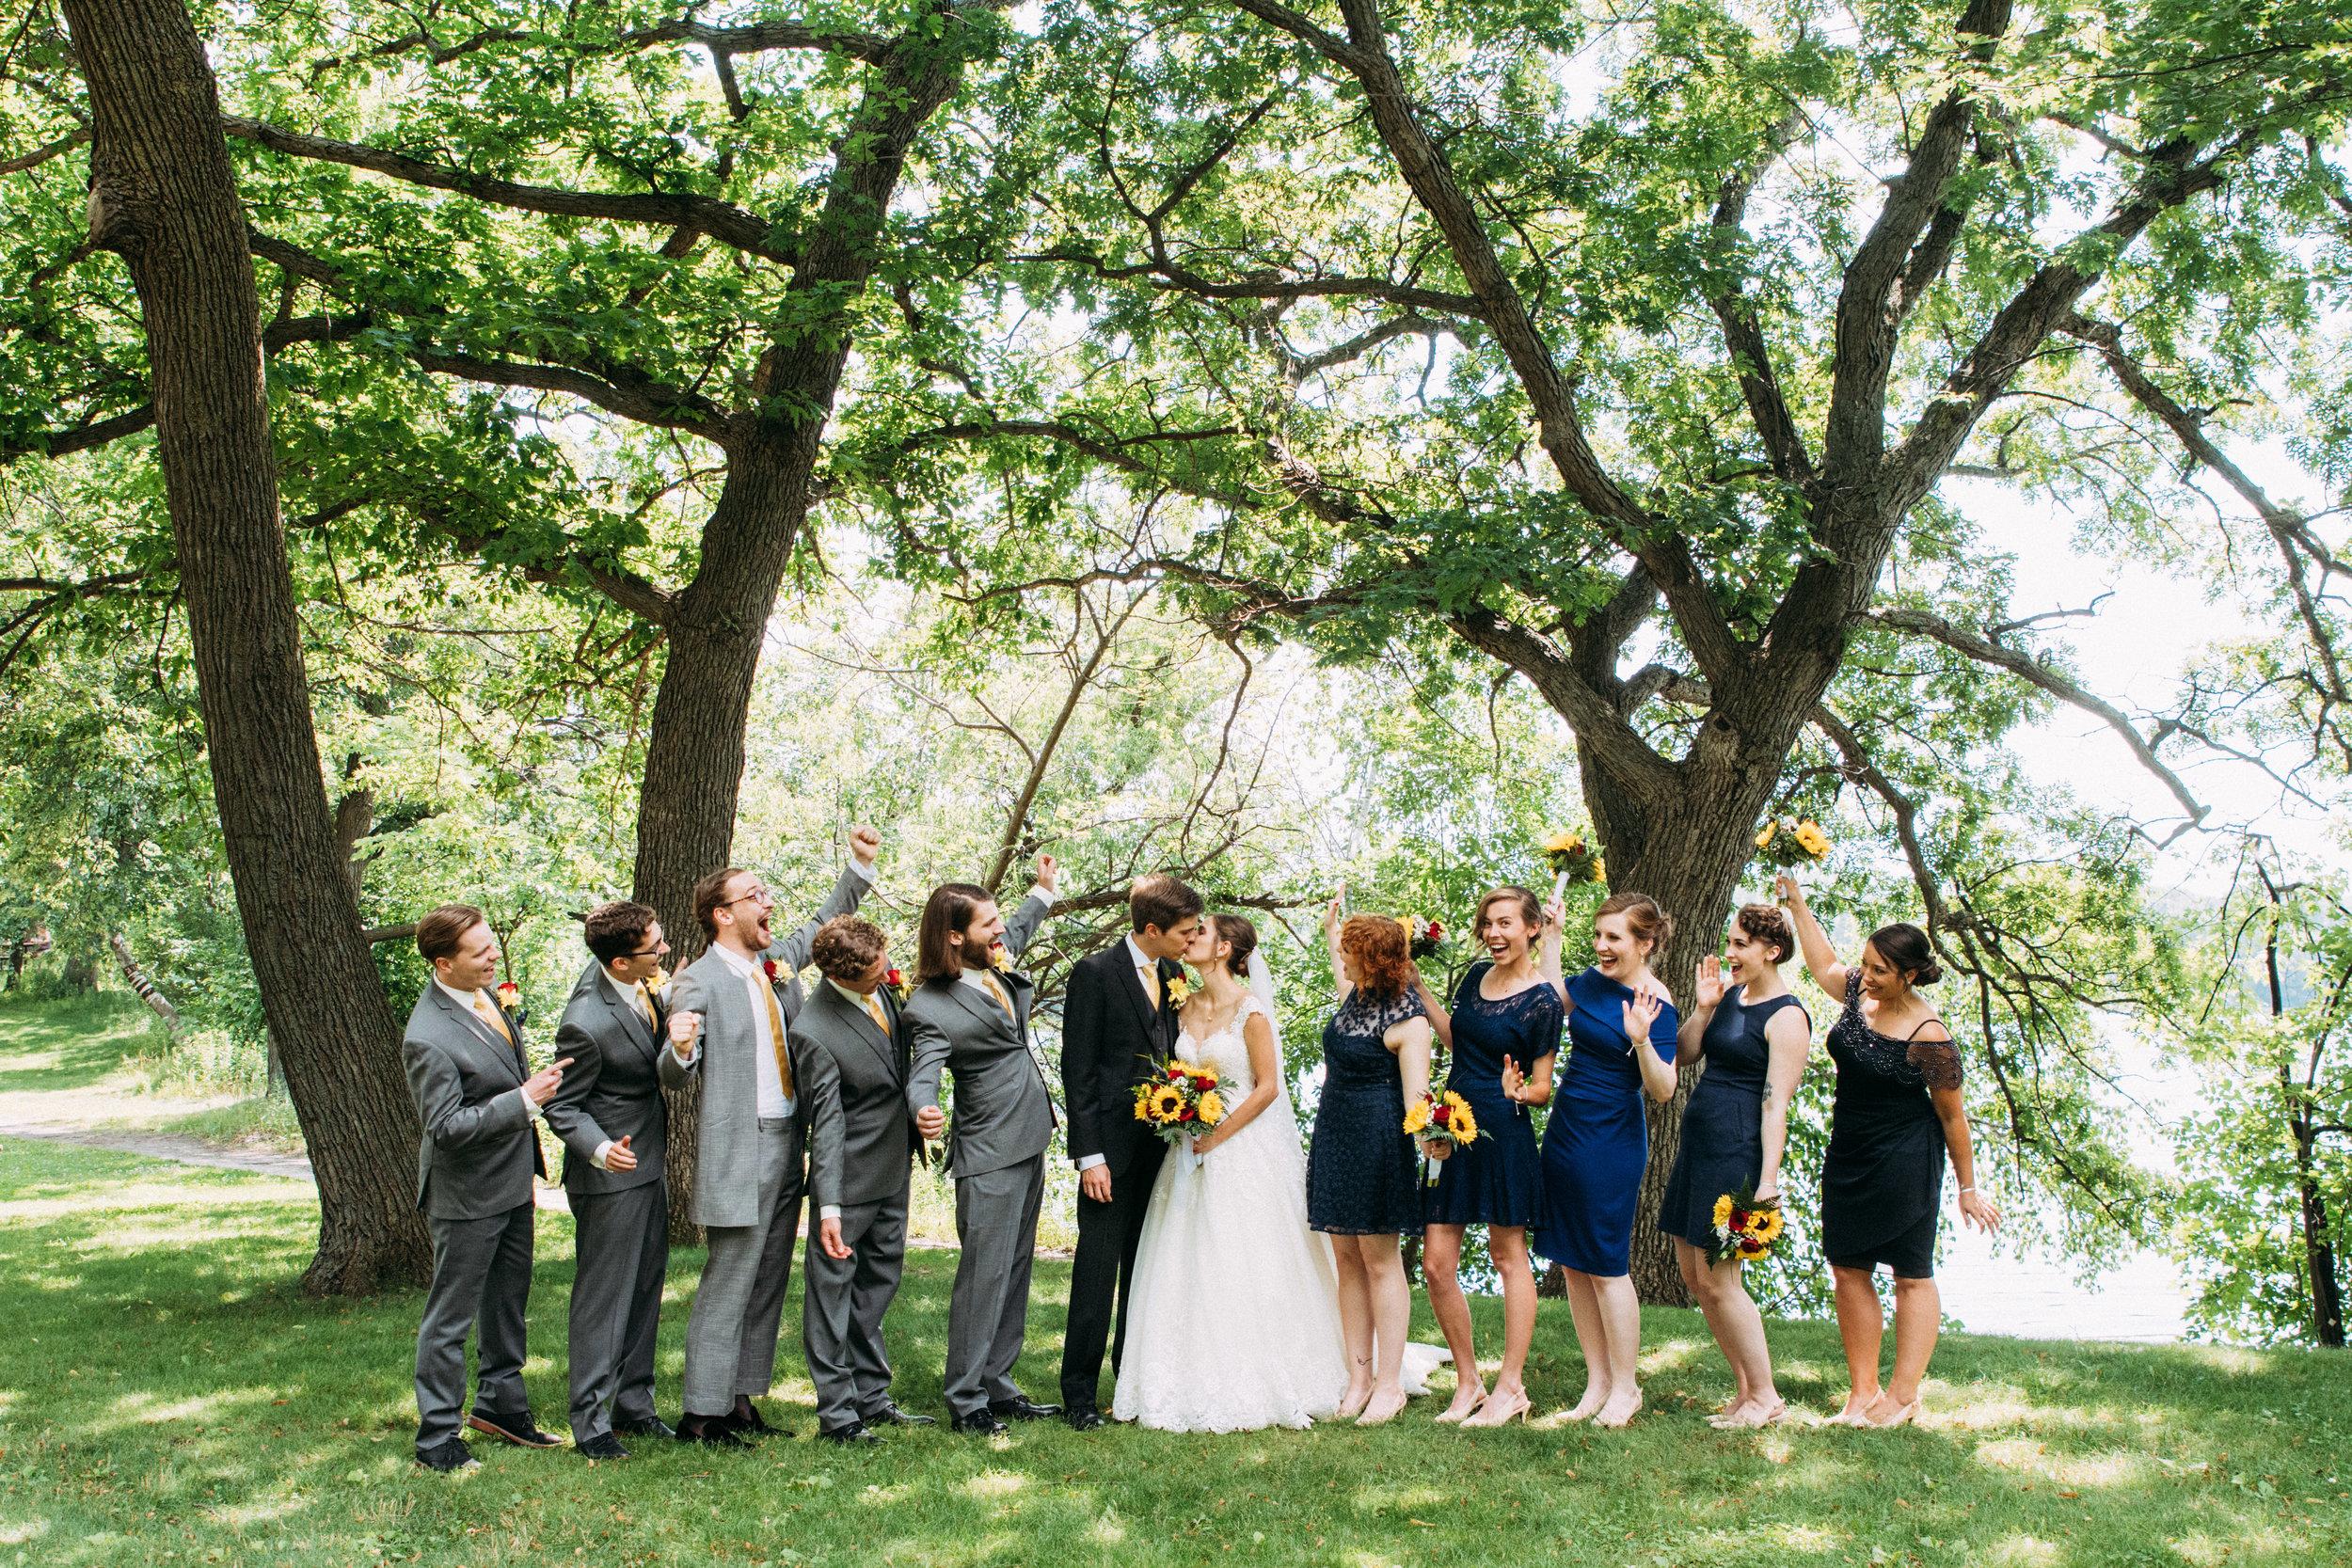 14-Liza_Chris_Minneapolis_Minnesota_Wedding.jpg